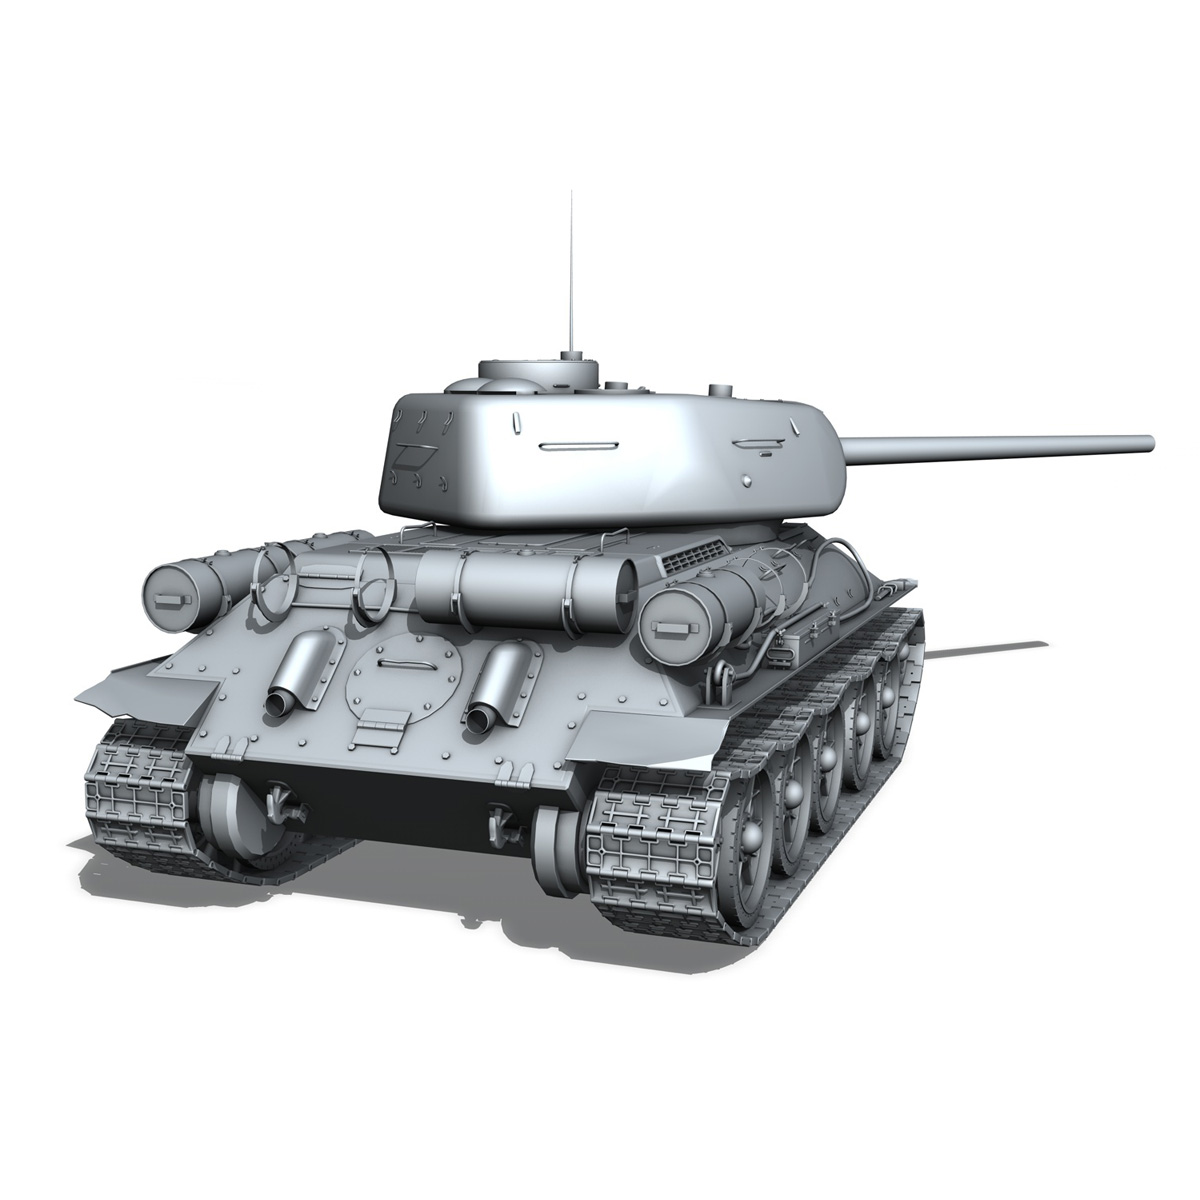 t-34 85 – soviet medium tank 3d model 3ds fbx lwo lw lws obj c4d 266412